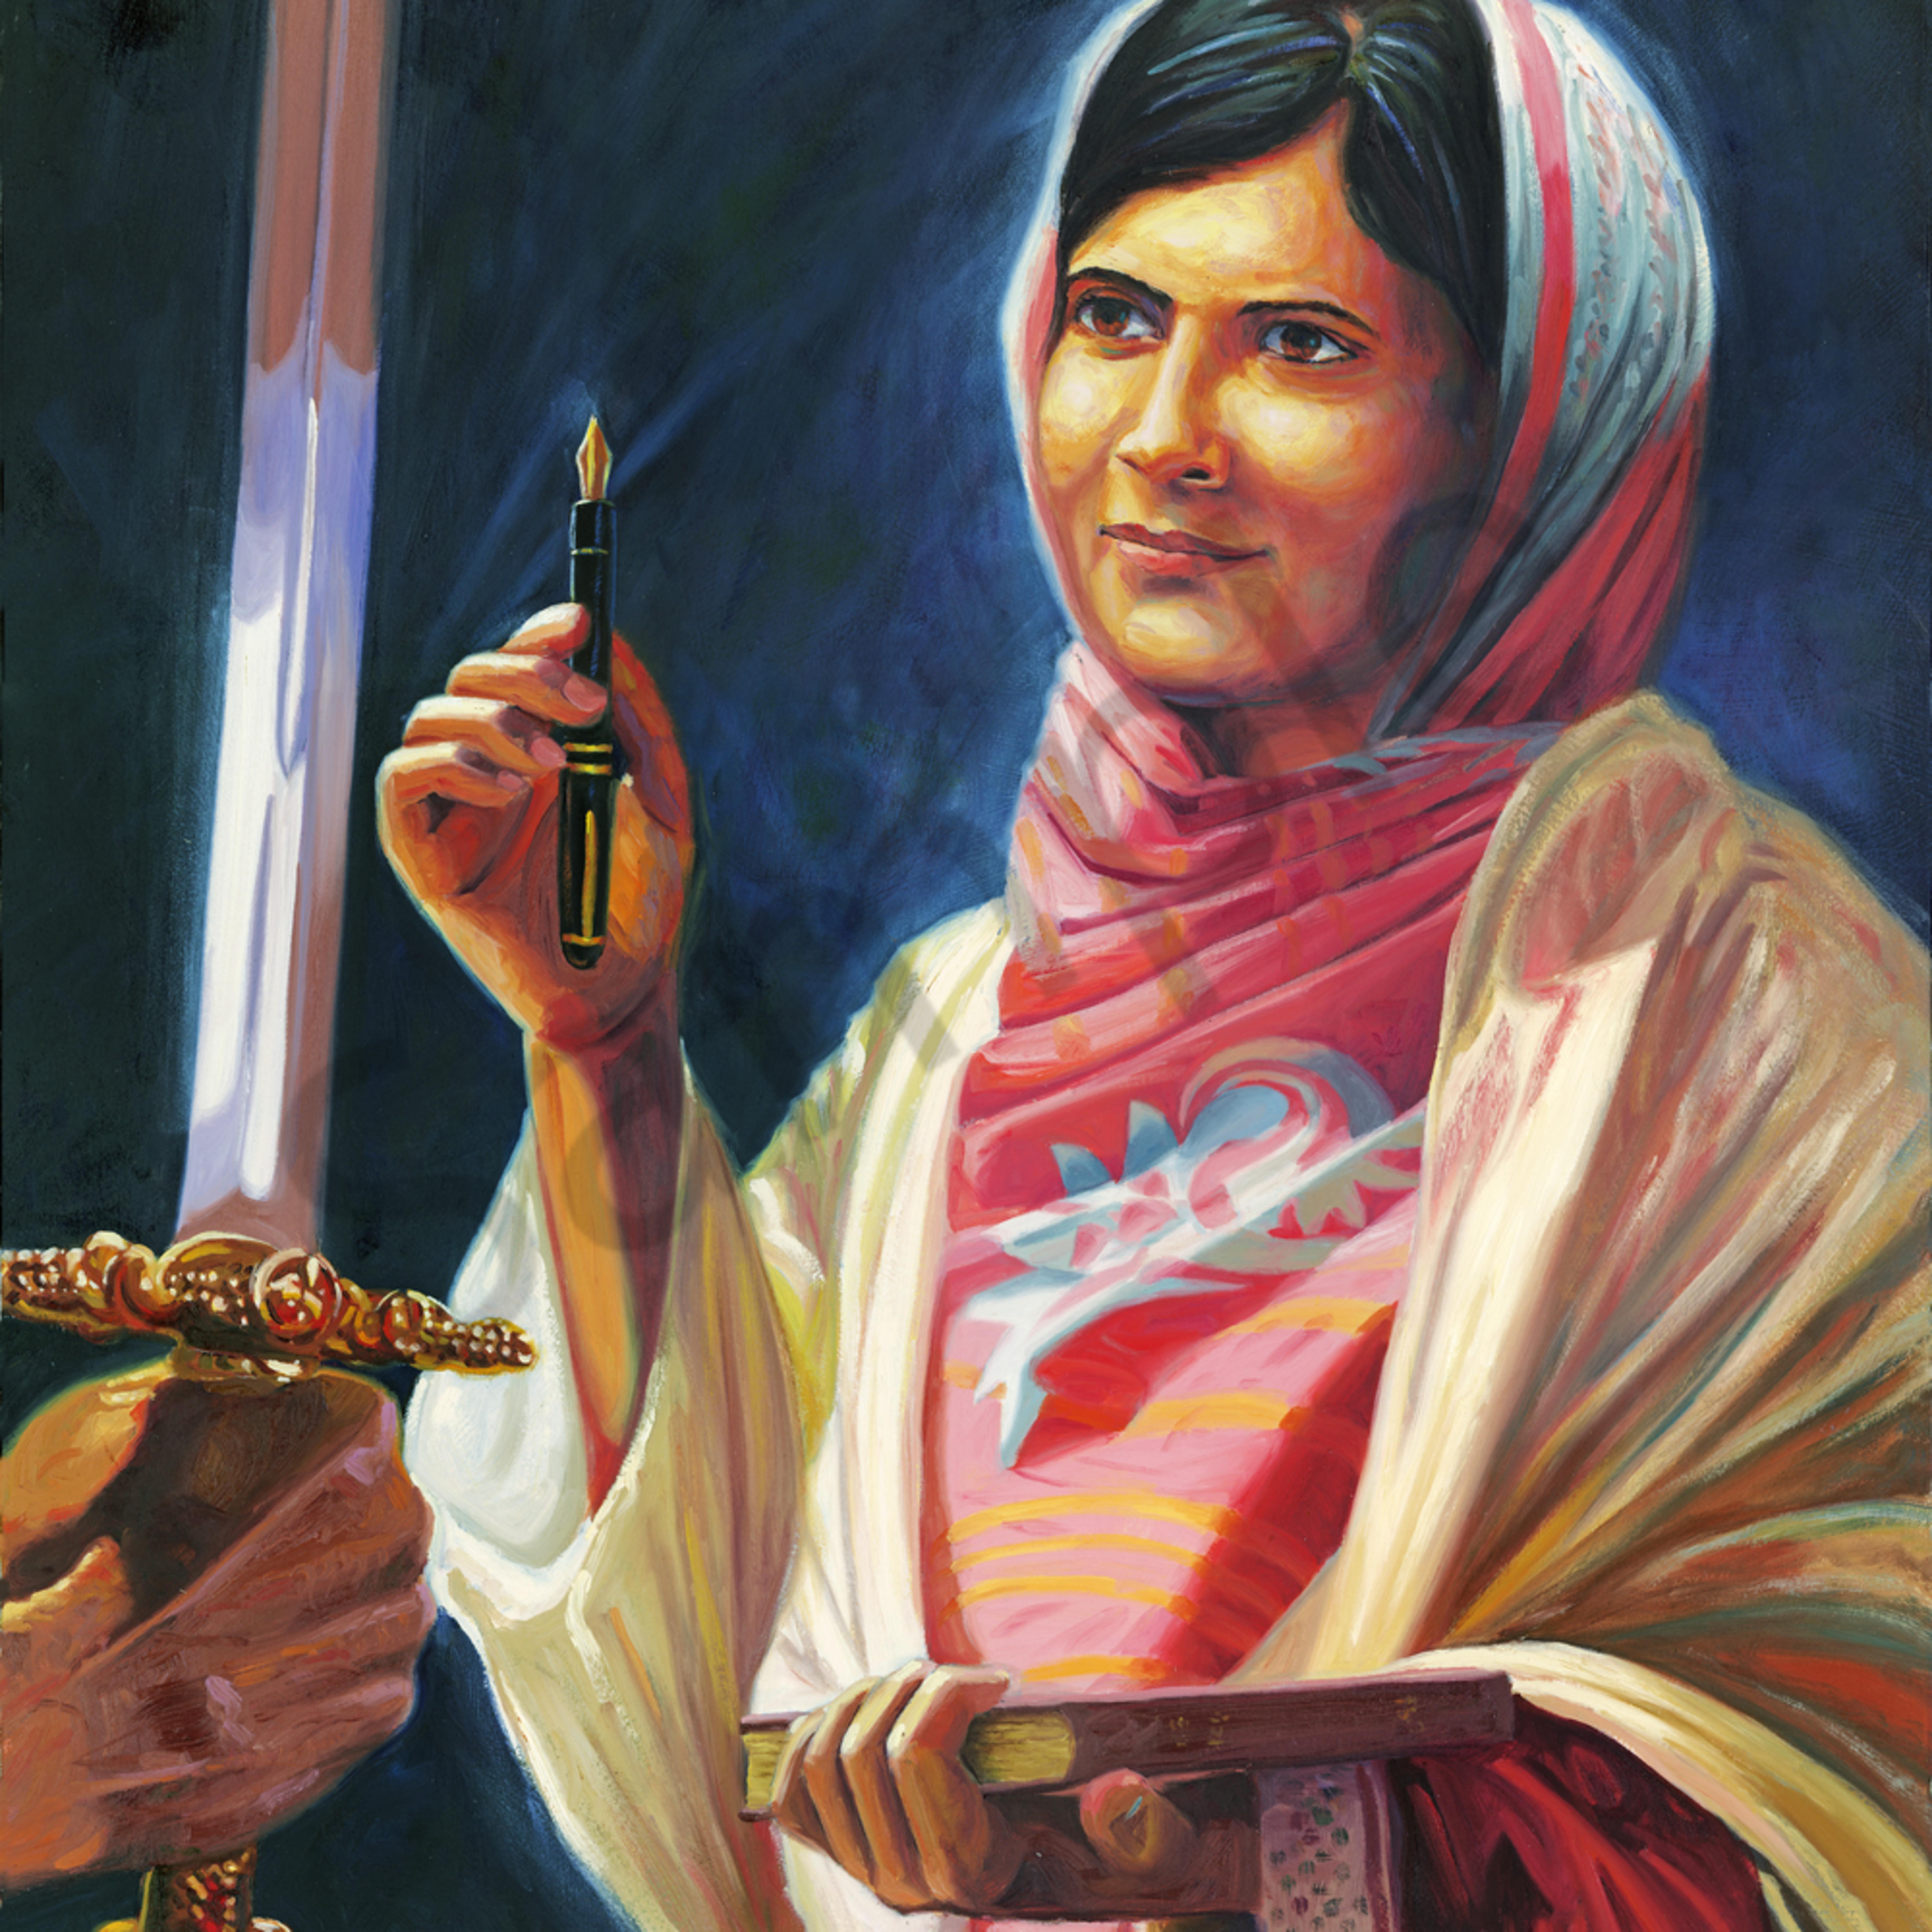 Malala yousafzai g8x4zv